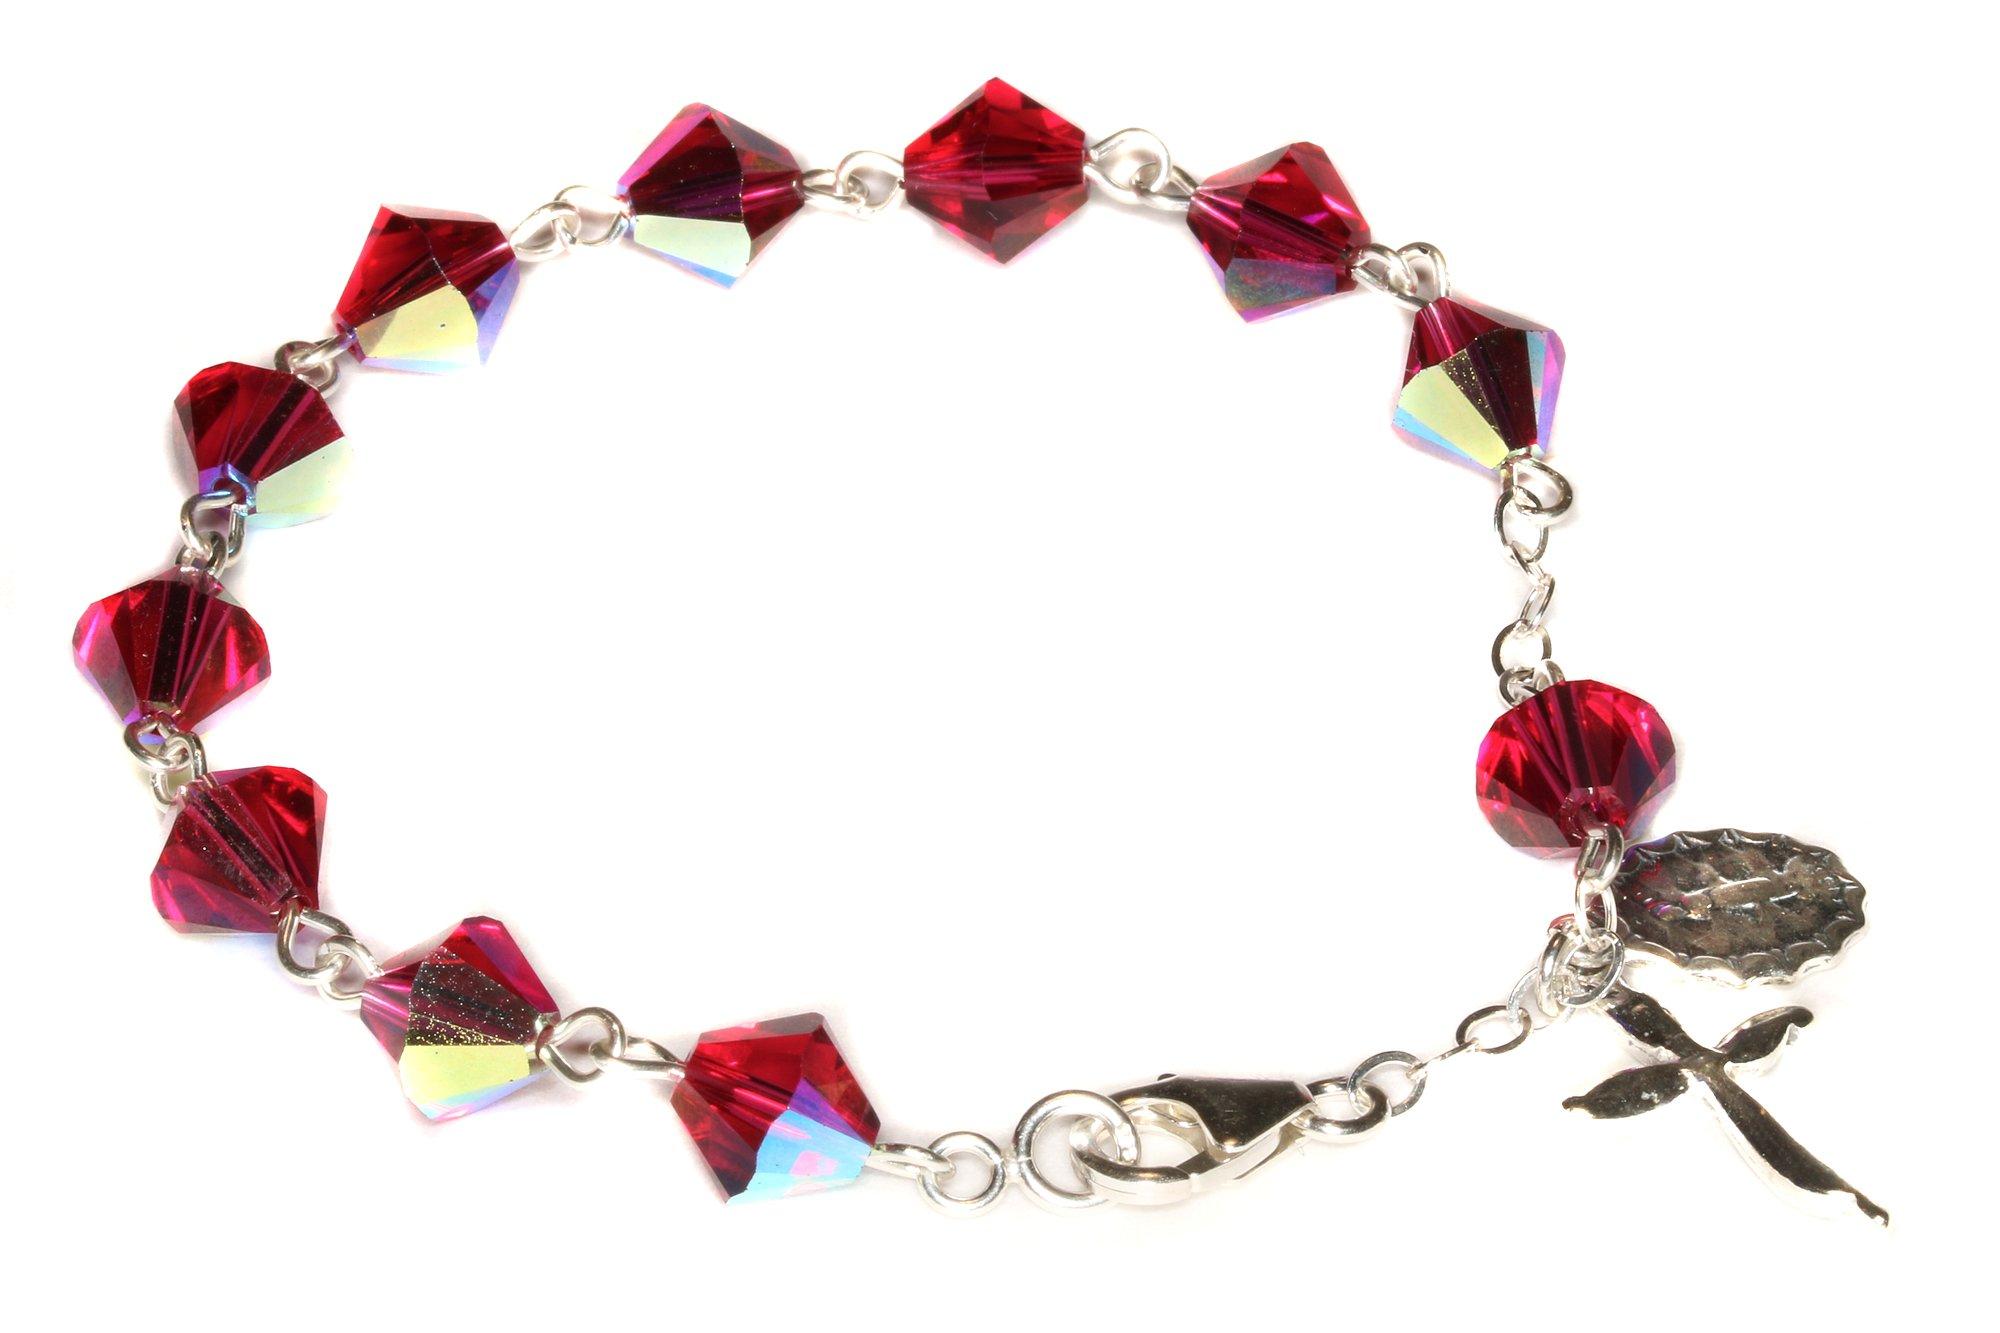 Womens Rosary Bracelet Made w/Ruby Red AB Swarovski Crystals (July) - Confirmation, RCIA, Valentine's, Birthday, More